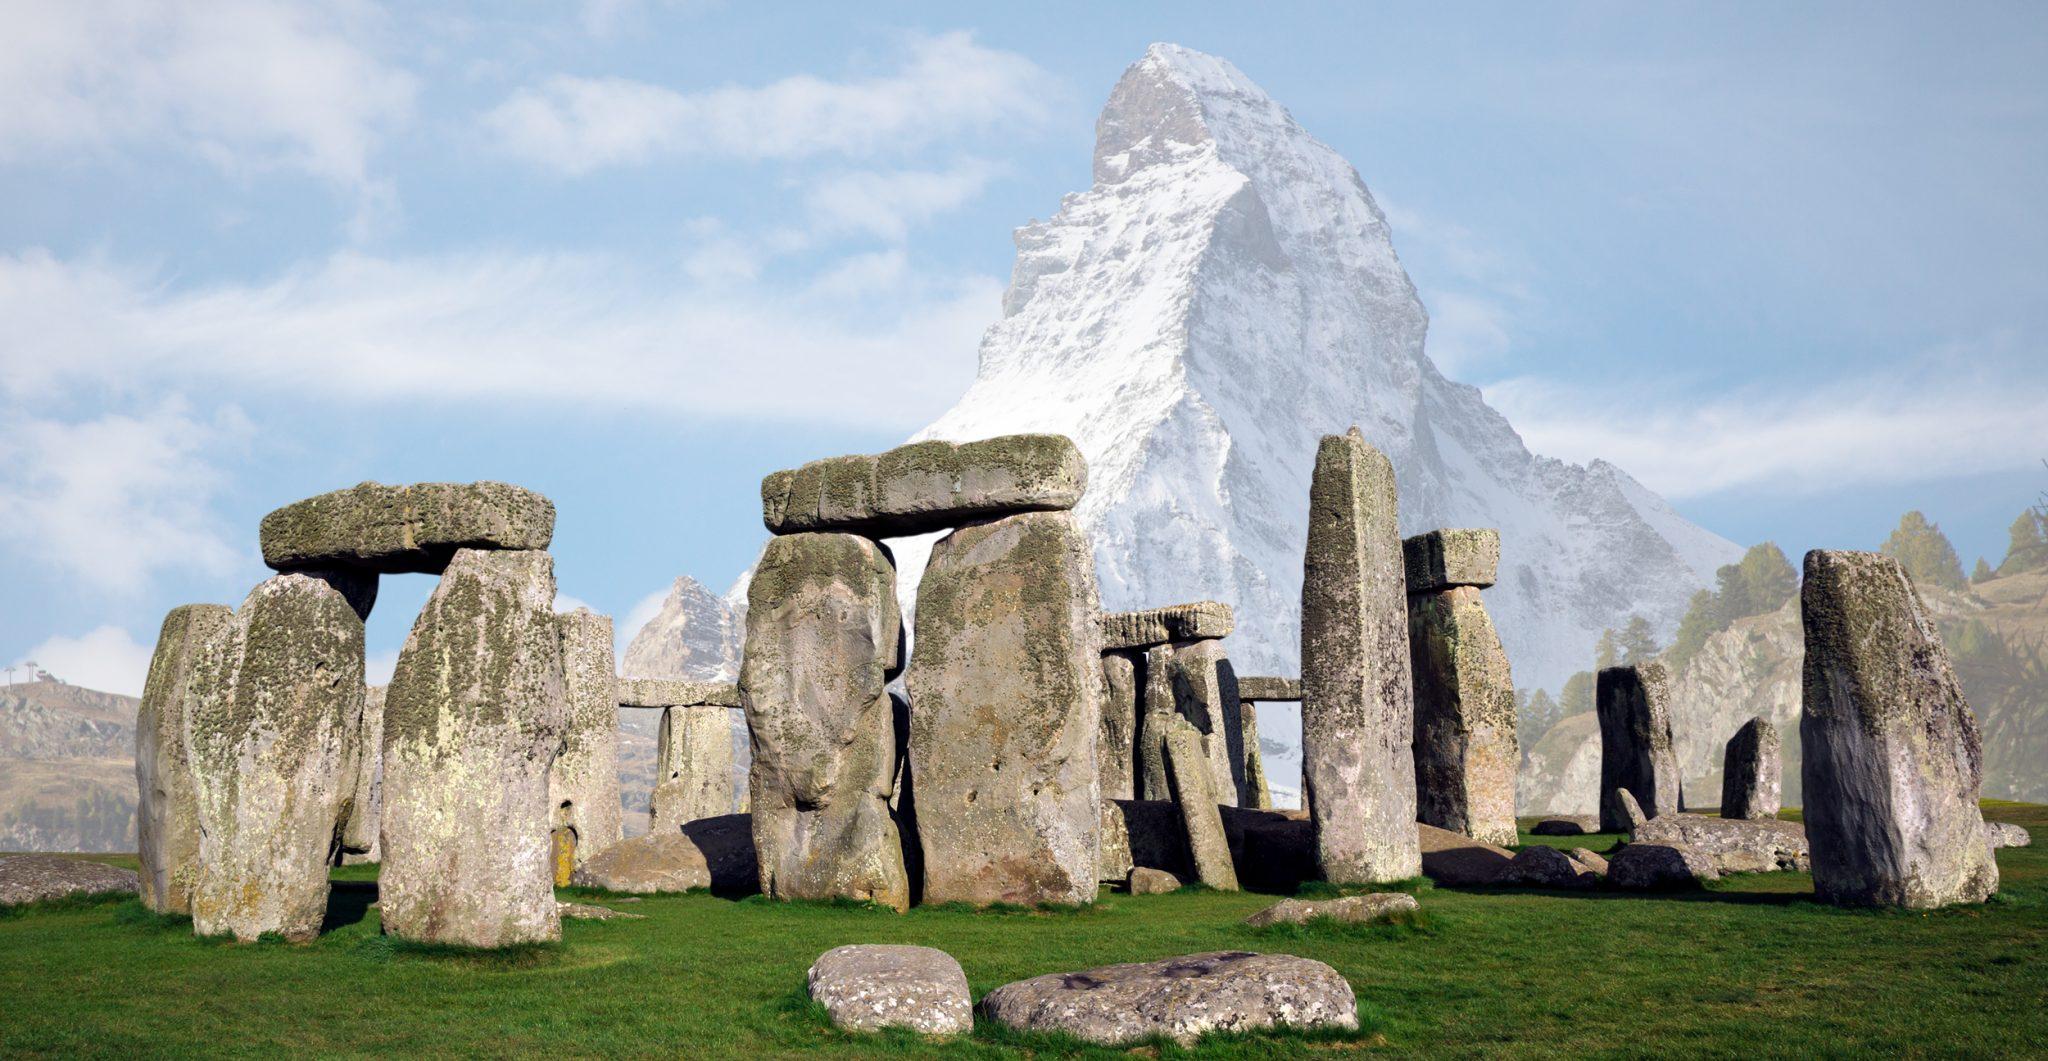 A stonehenge in Switzerland